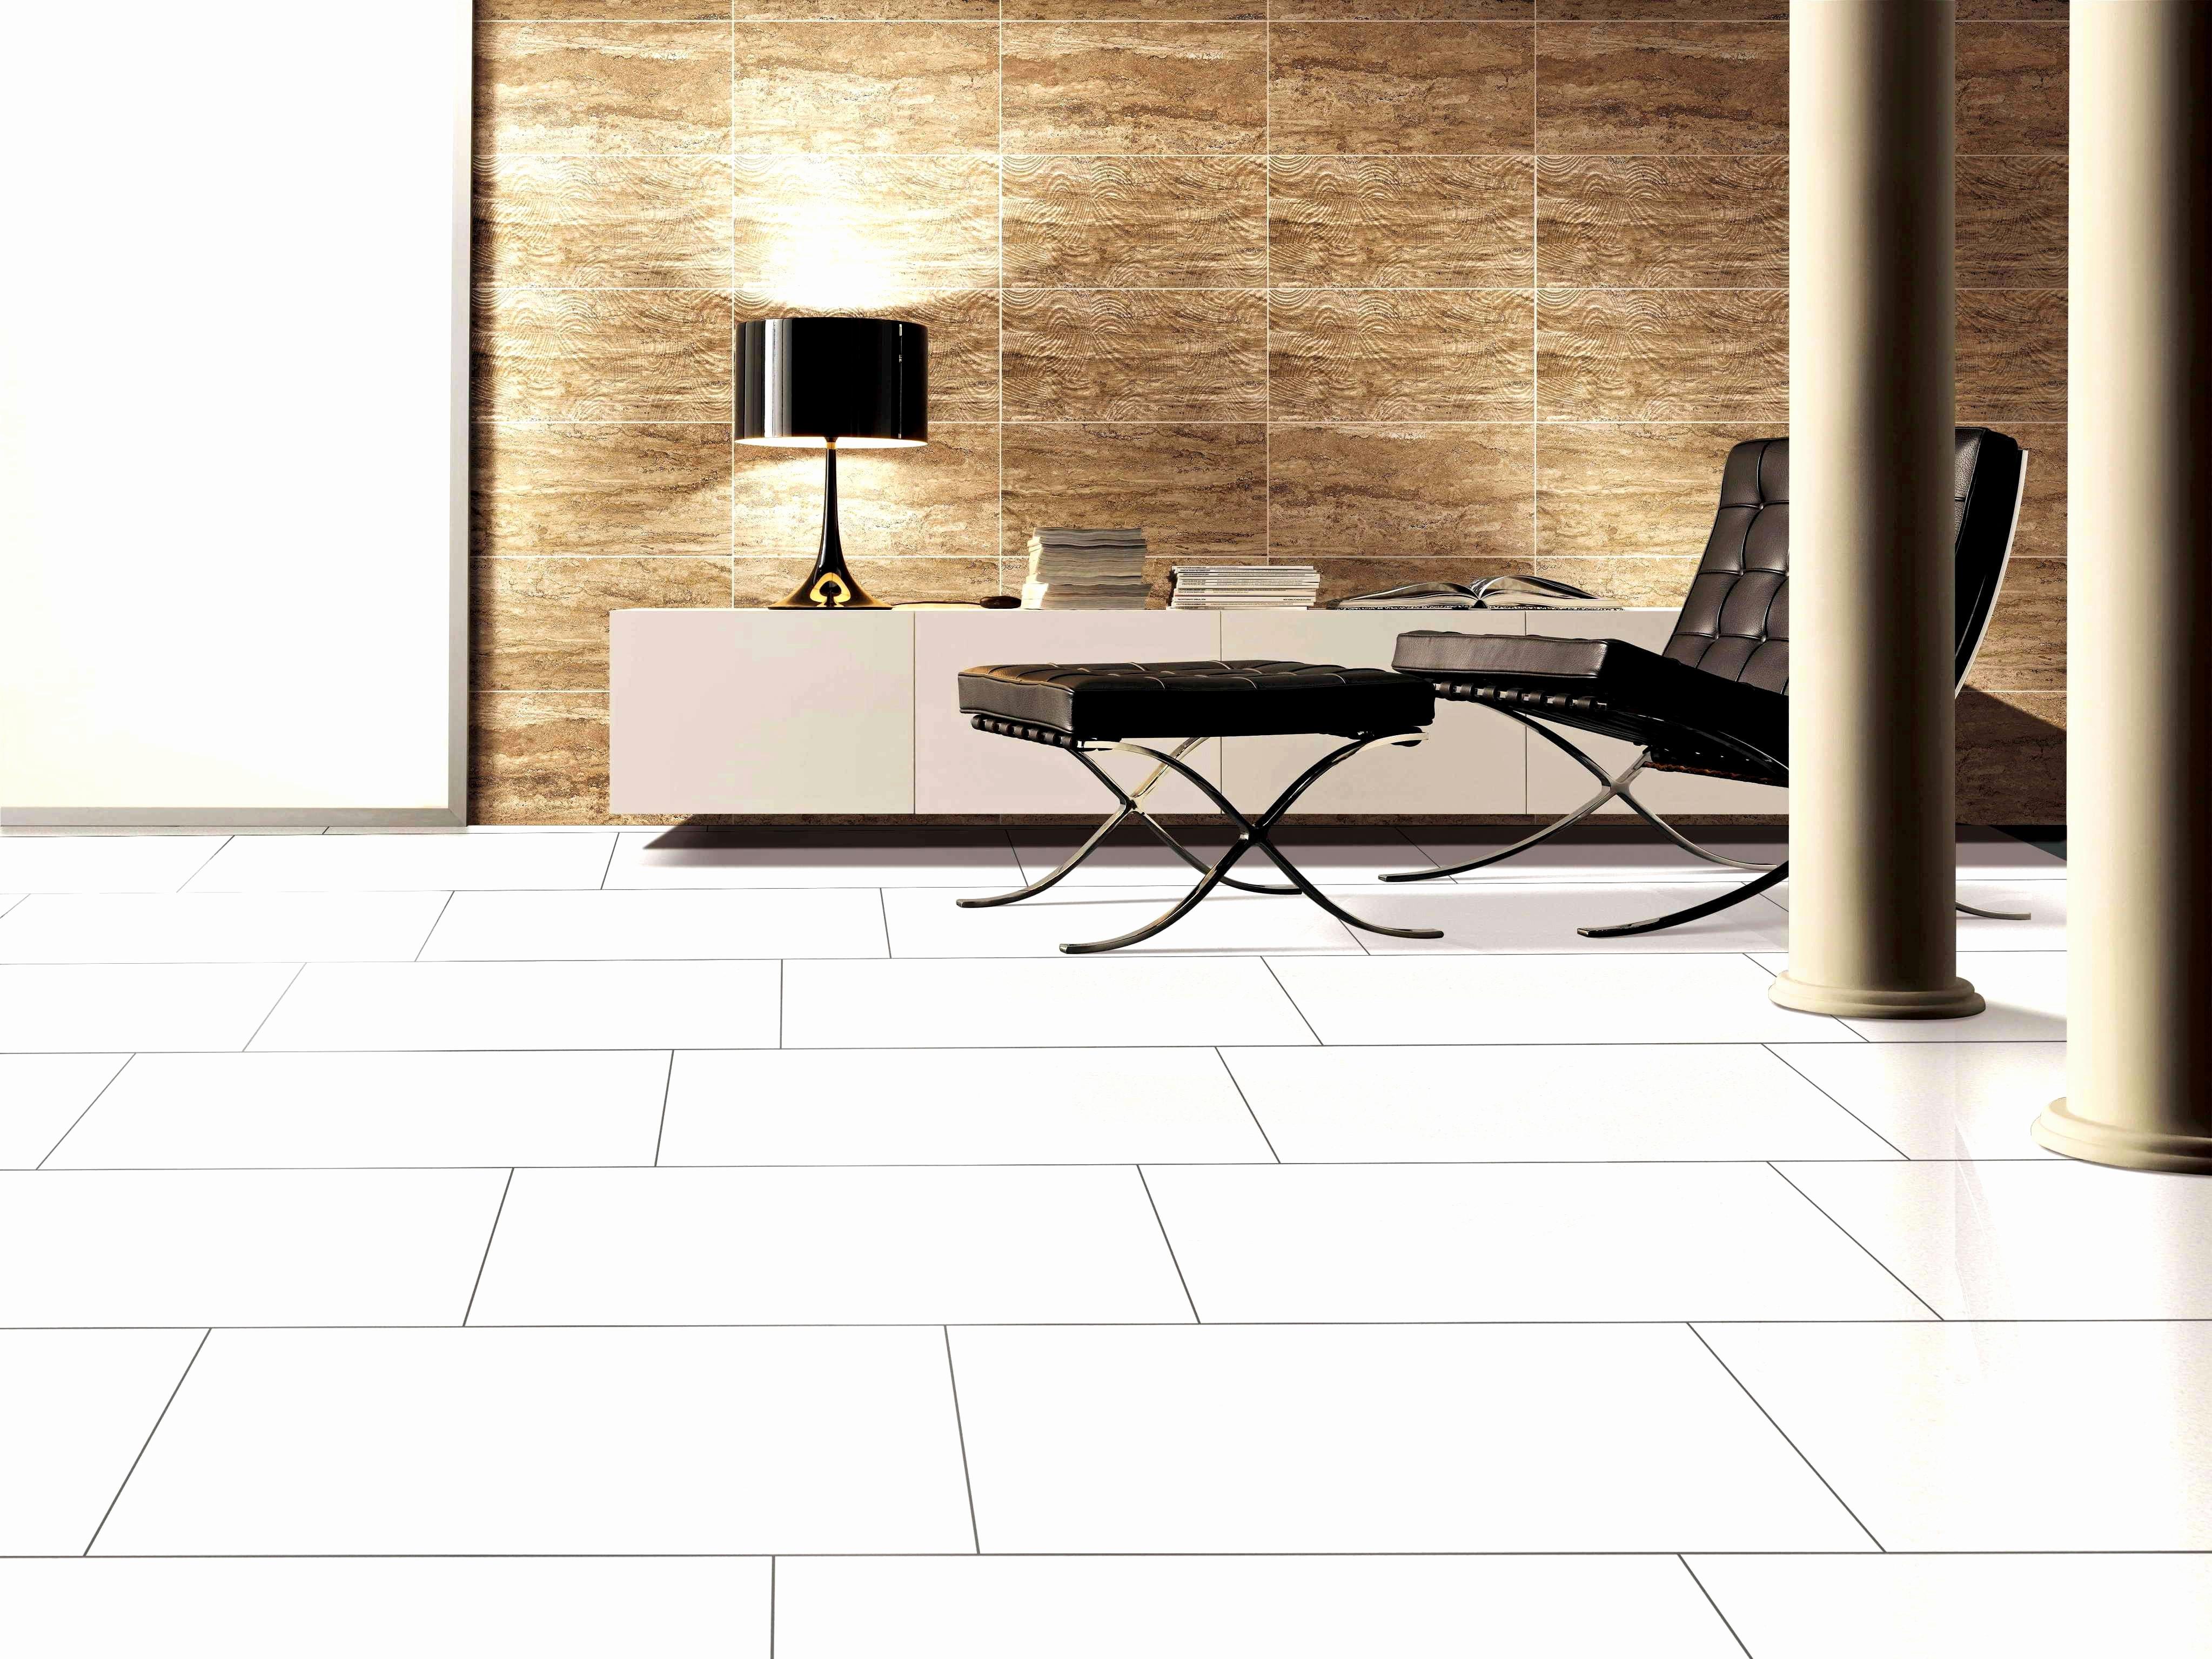 kitchens with grey hardwood floors of kitchen floor tiles design kitchen and bath tile luxury new tile intended for kitchen floor tiles design kitchen and bath tile luxury new tile floor mosaic bathroom 0d new